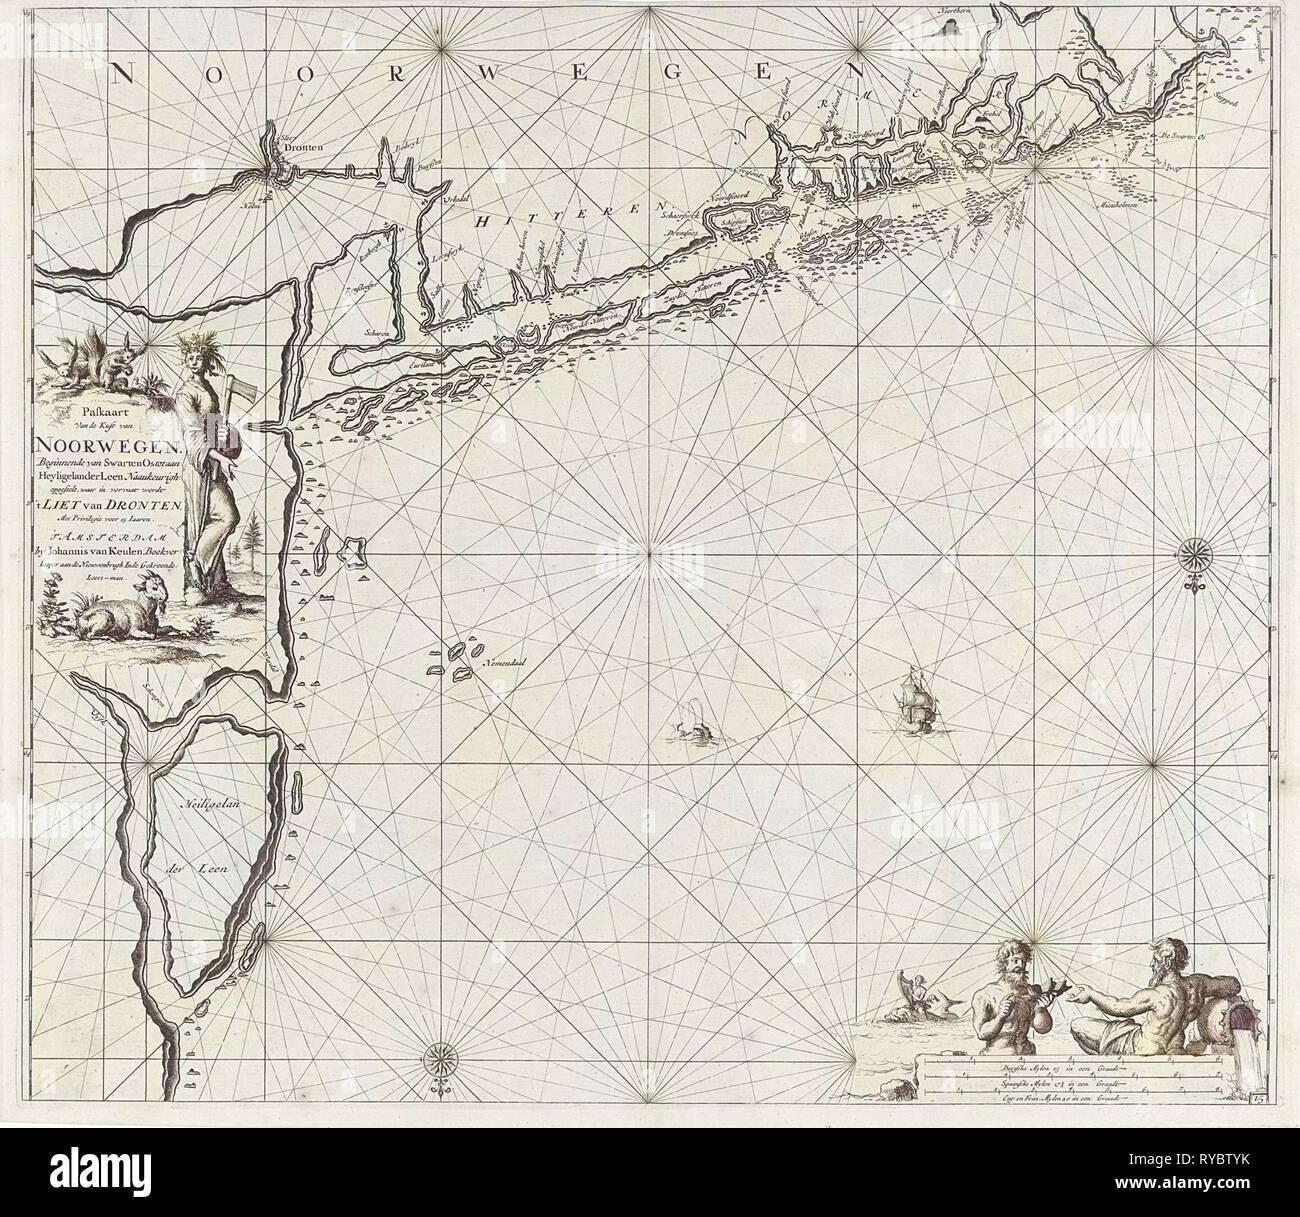 Sea chart of the coast of Norway near Trondheim, Jan Luyken, Johannes van Keulen (I), unknown, 1681 - 1799 - Stock Image